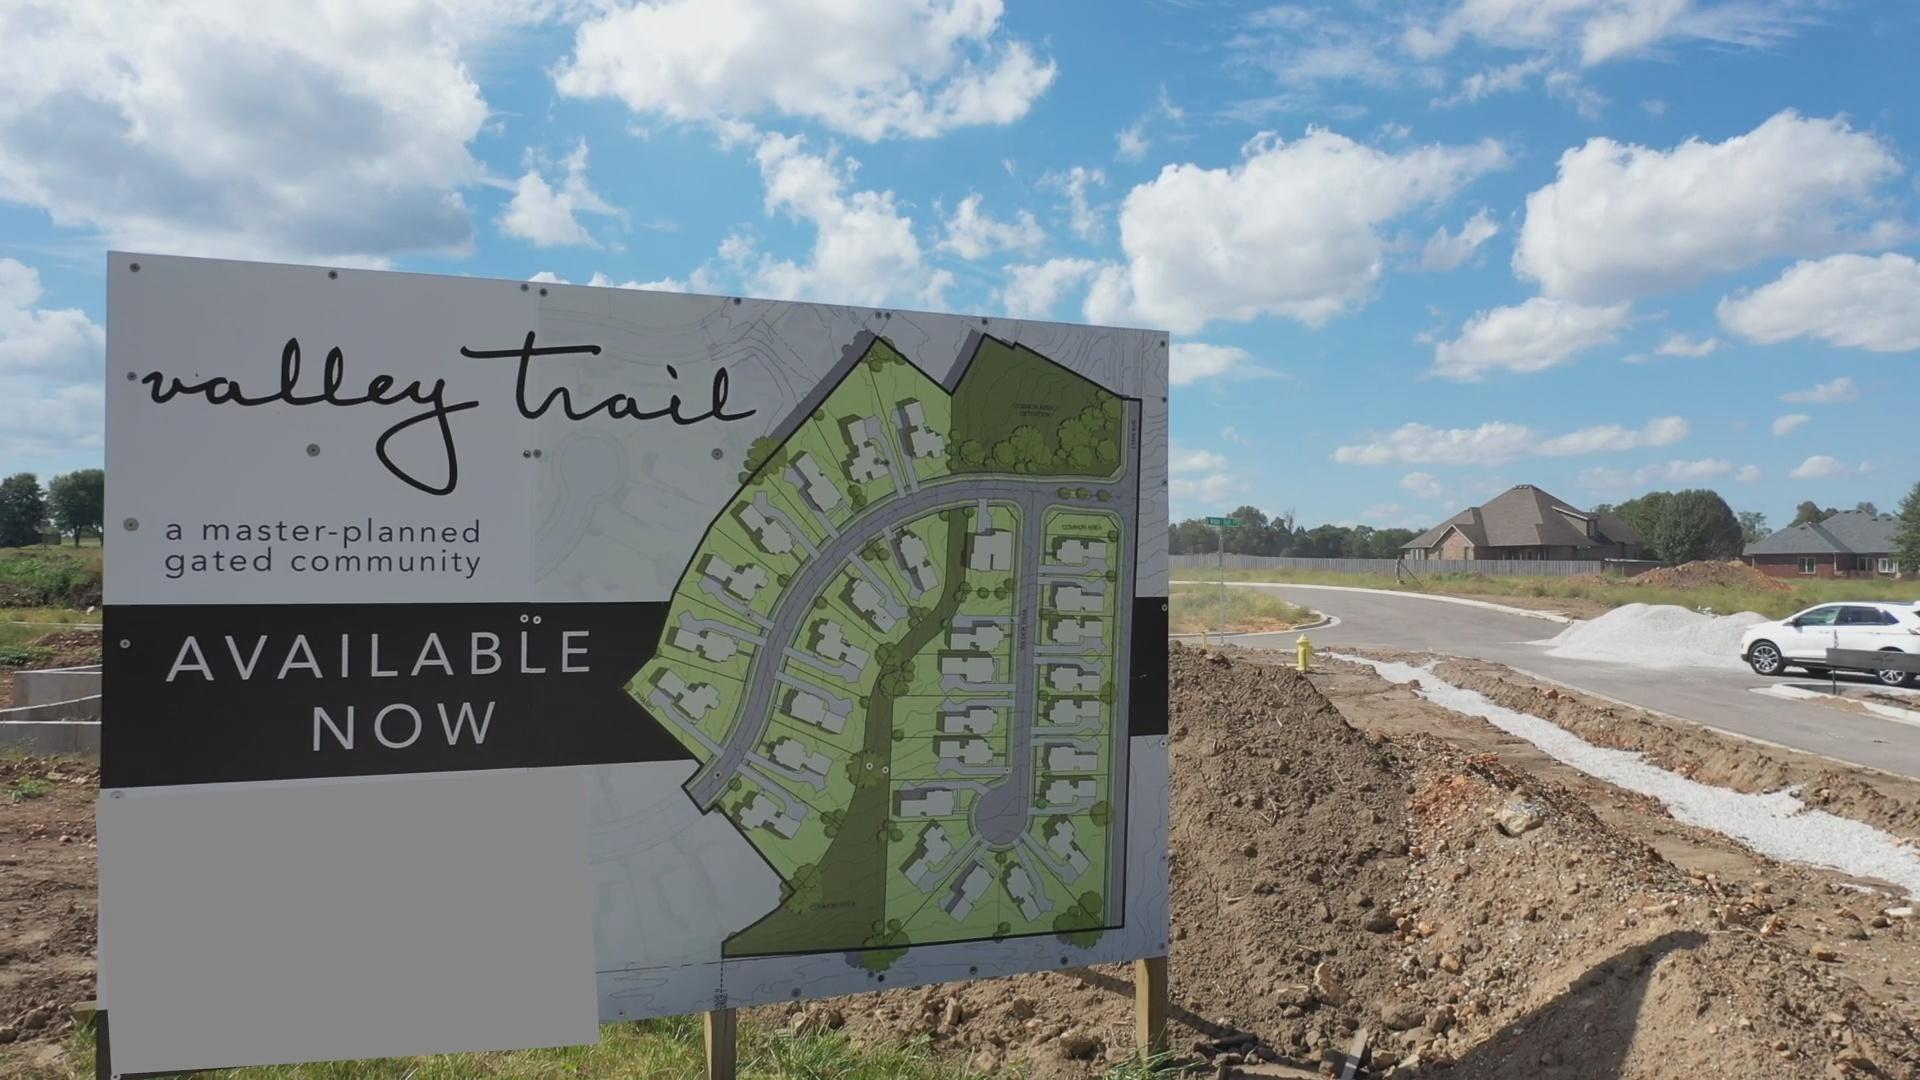 Lot 10 Valley Trail Subdivision Republic, MO 65738